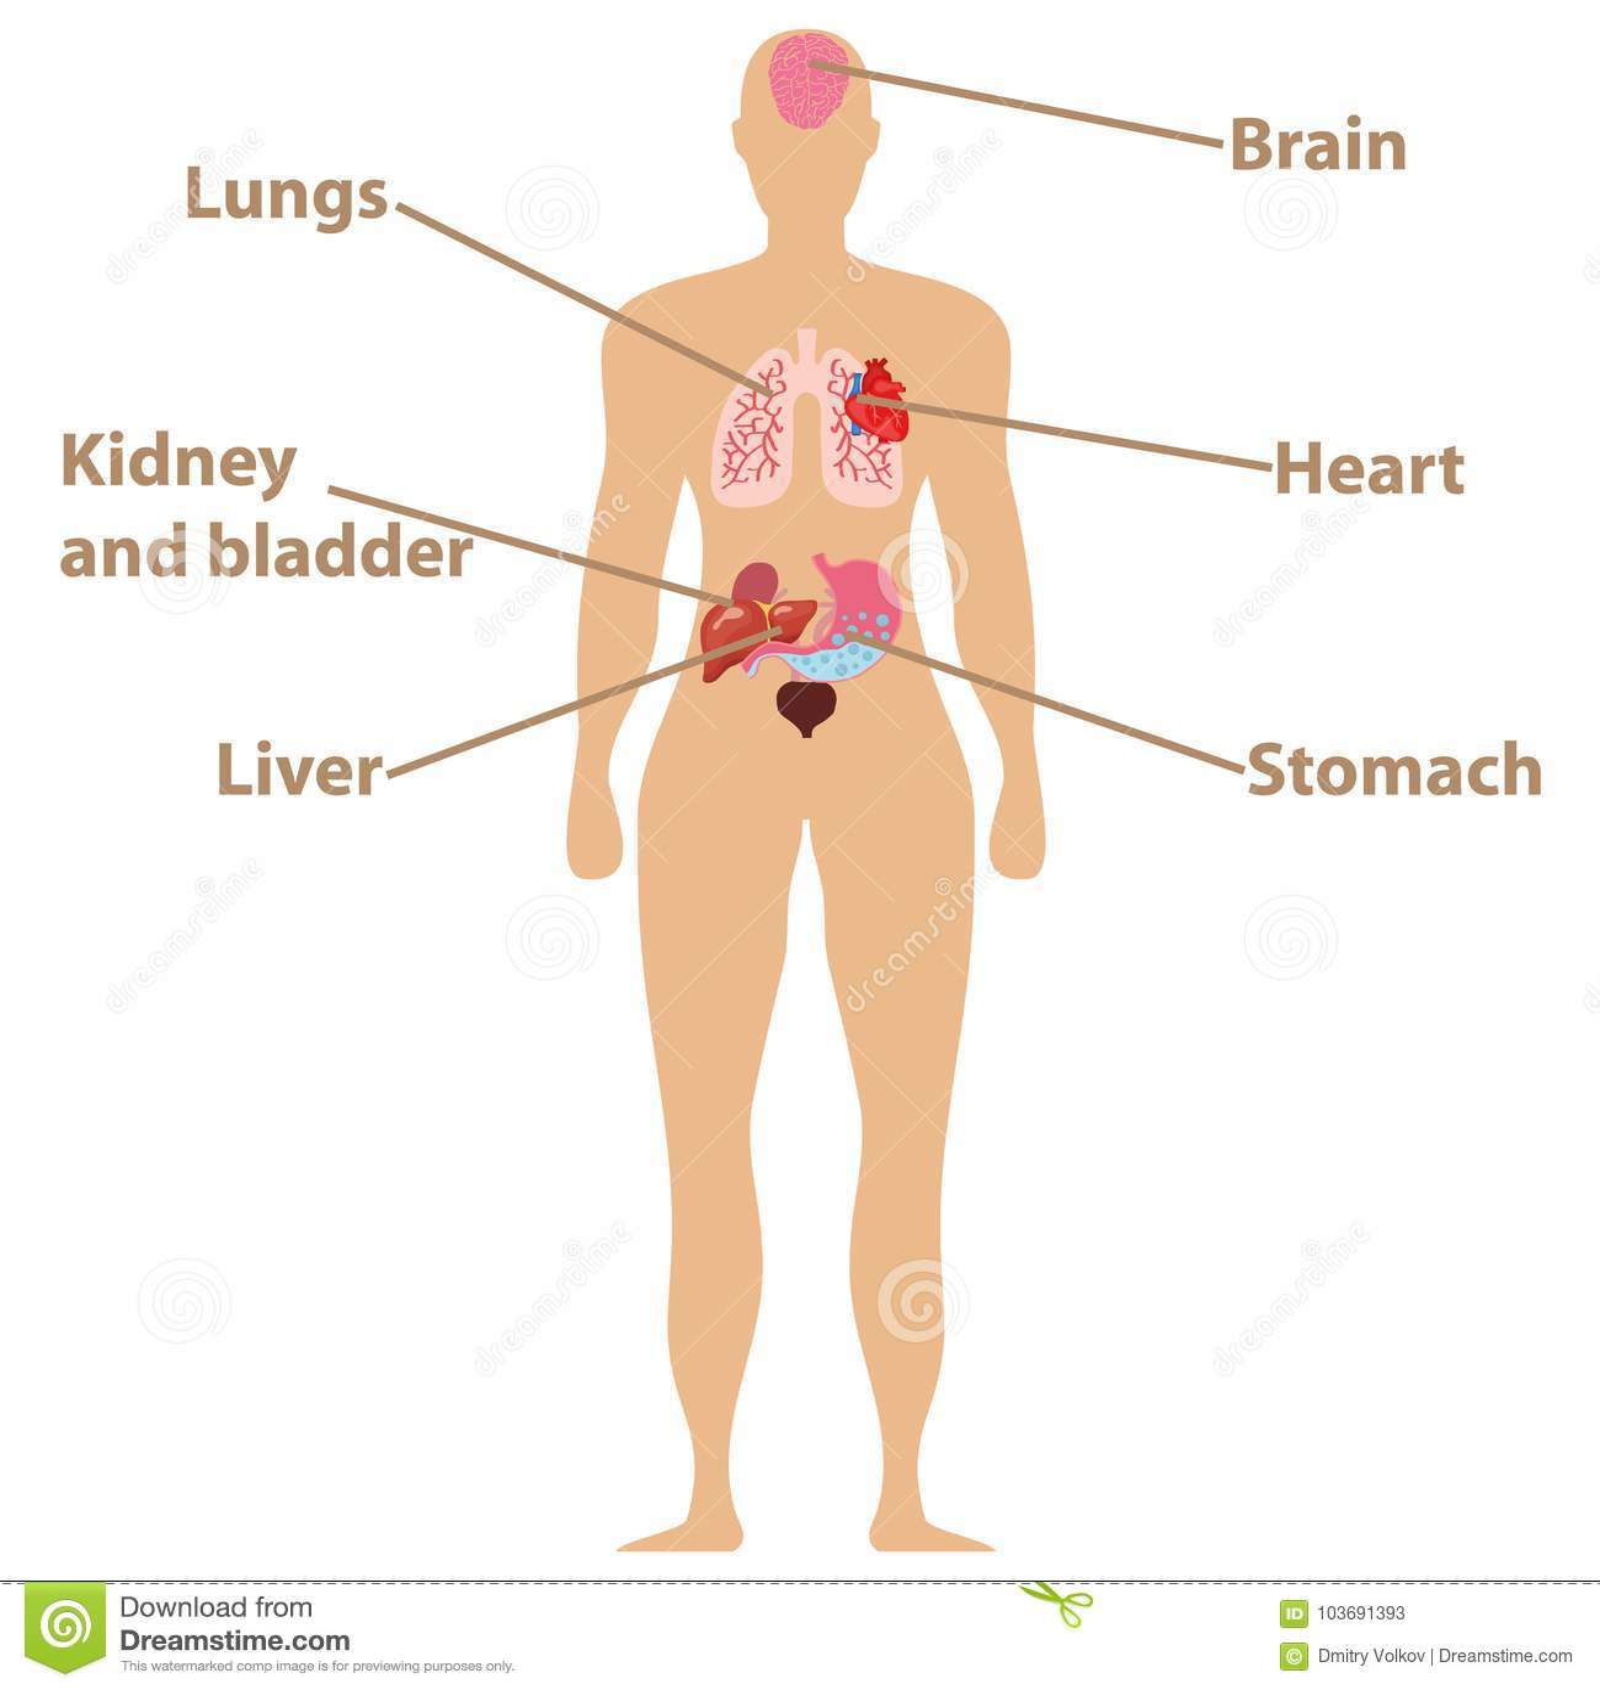 Anatomía Humana Órganos Humanos, Corazón, Cerebro, Hígado, Estómago ...